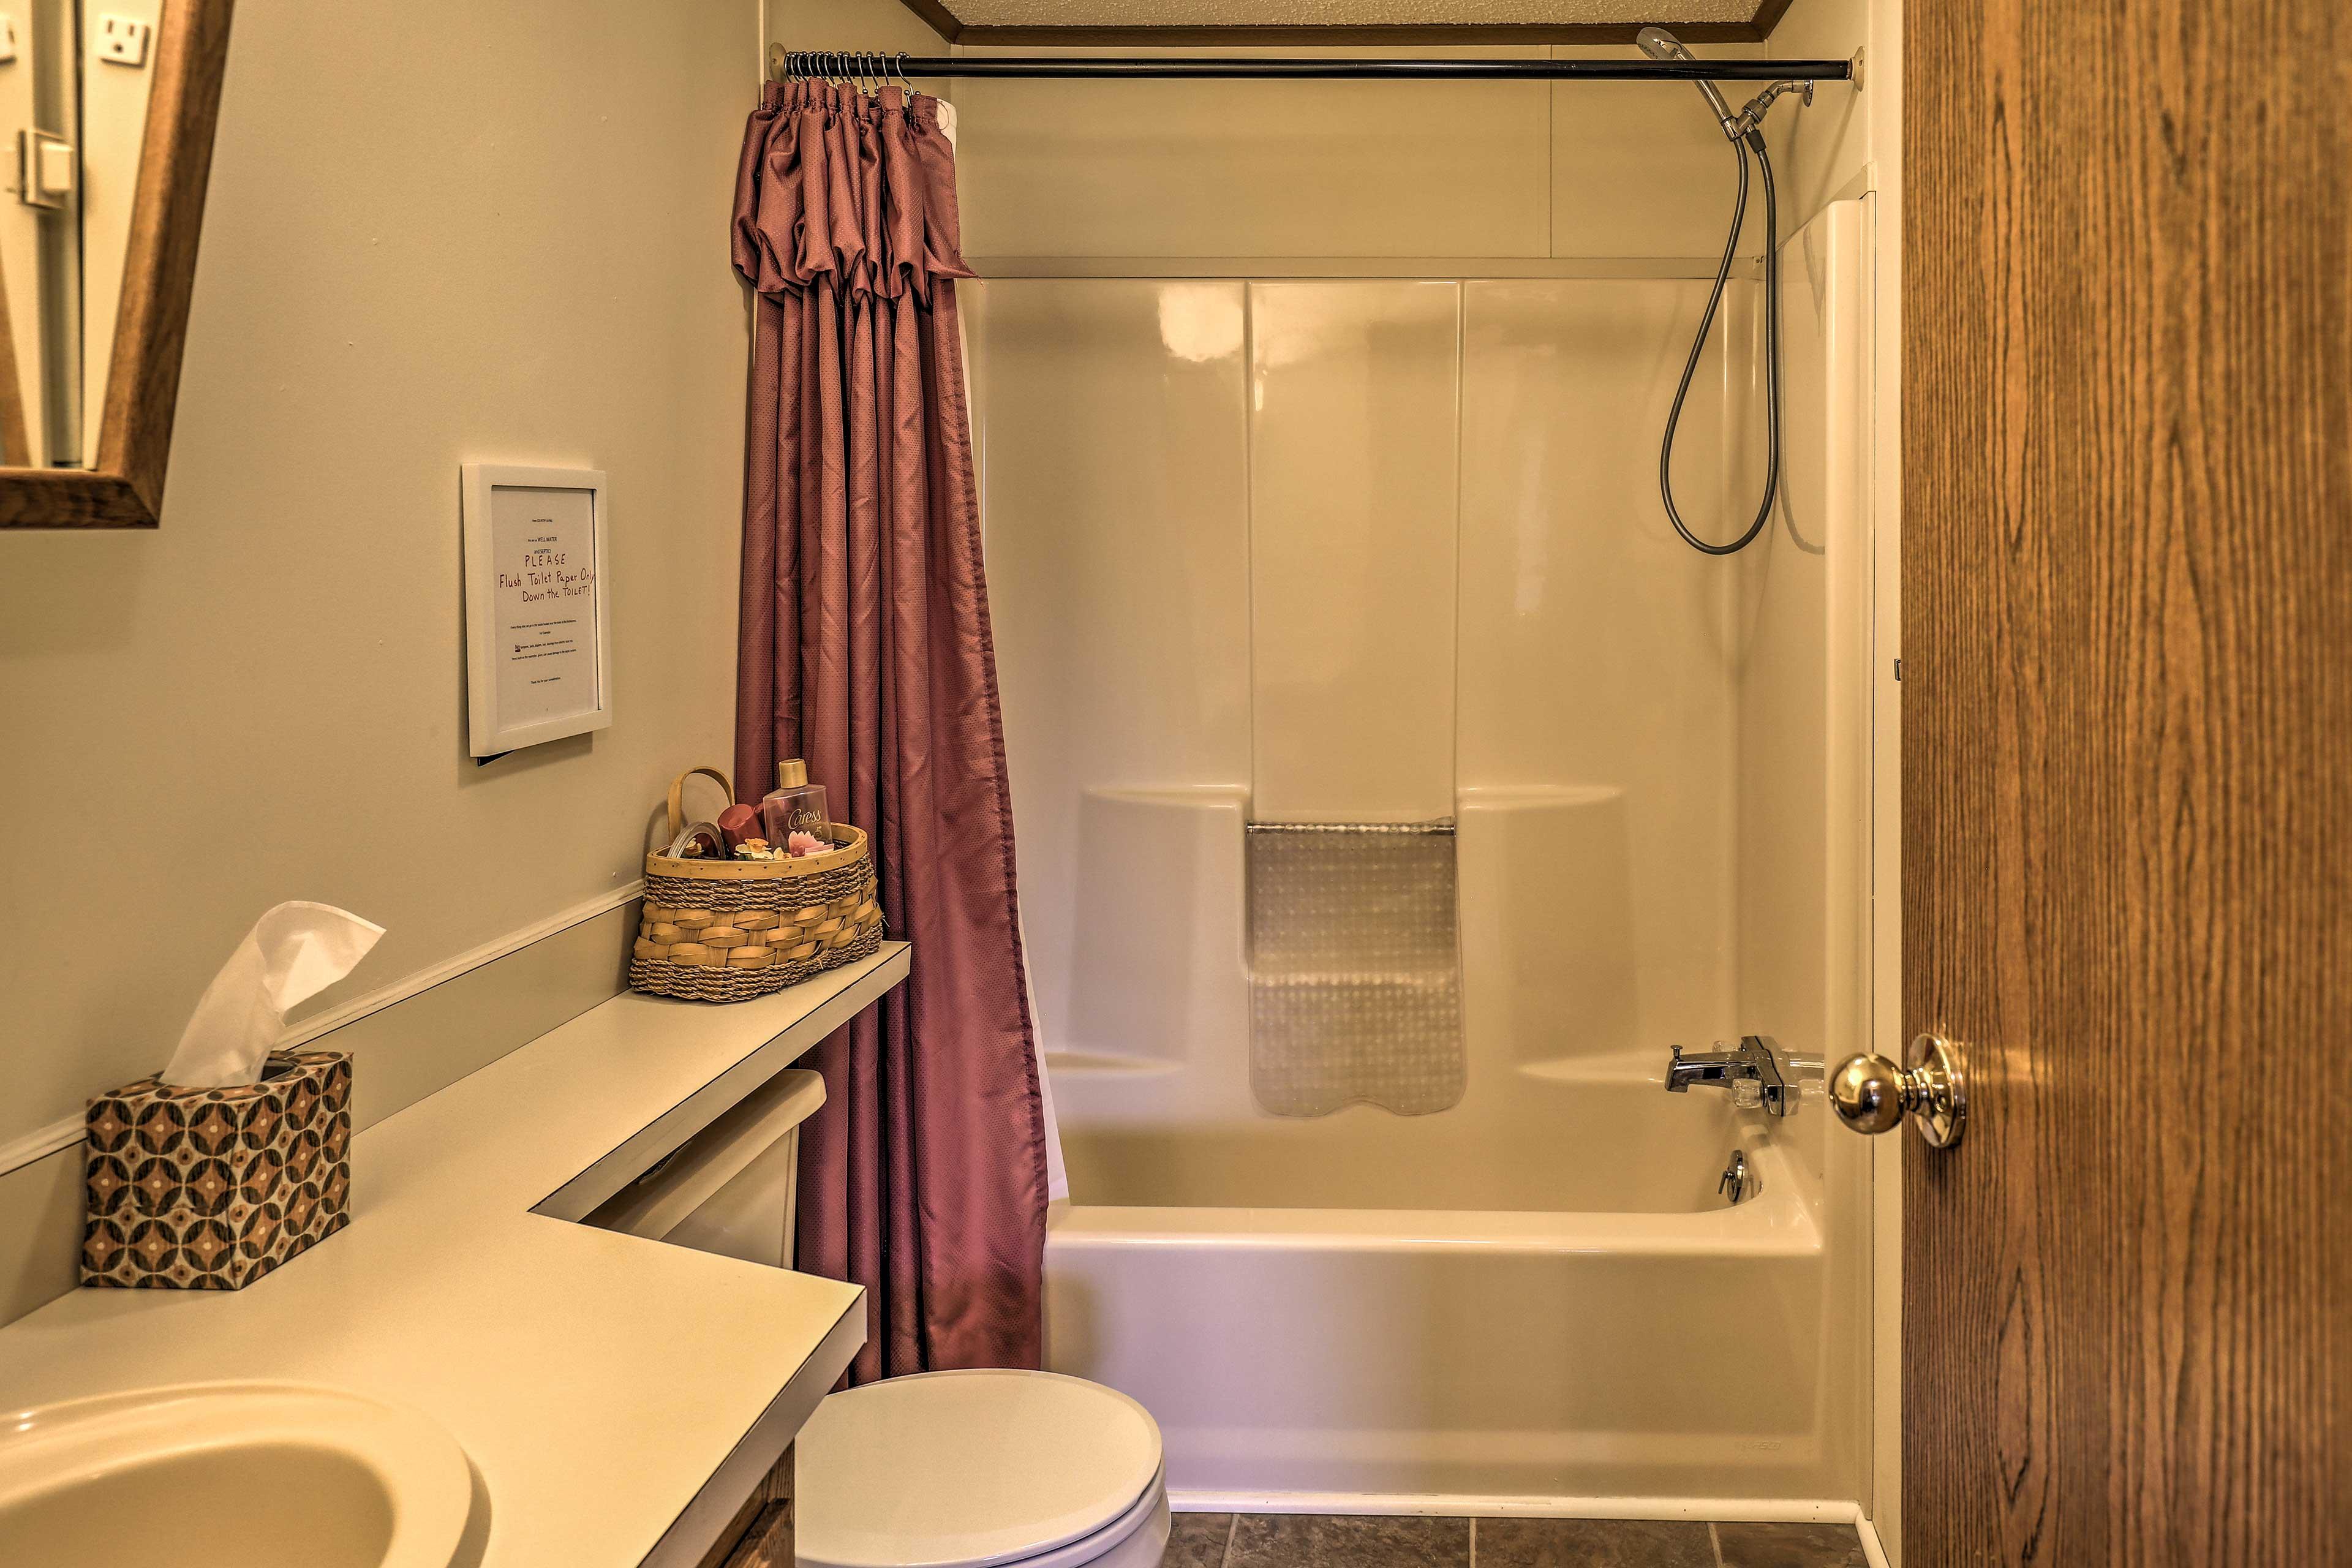 Full Bathroom | Basic Toiletries